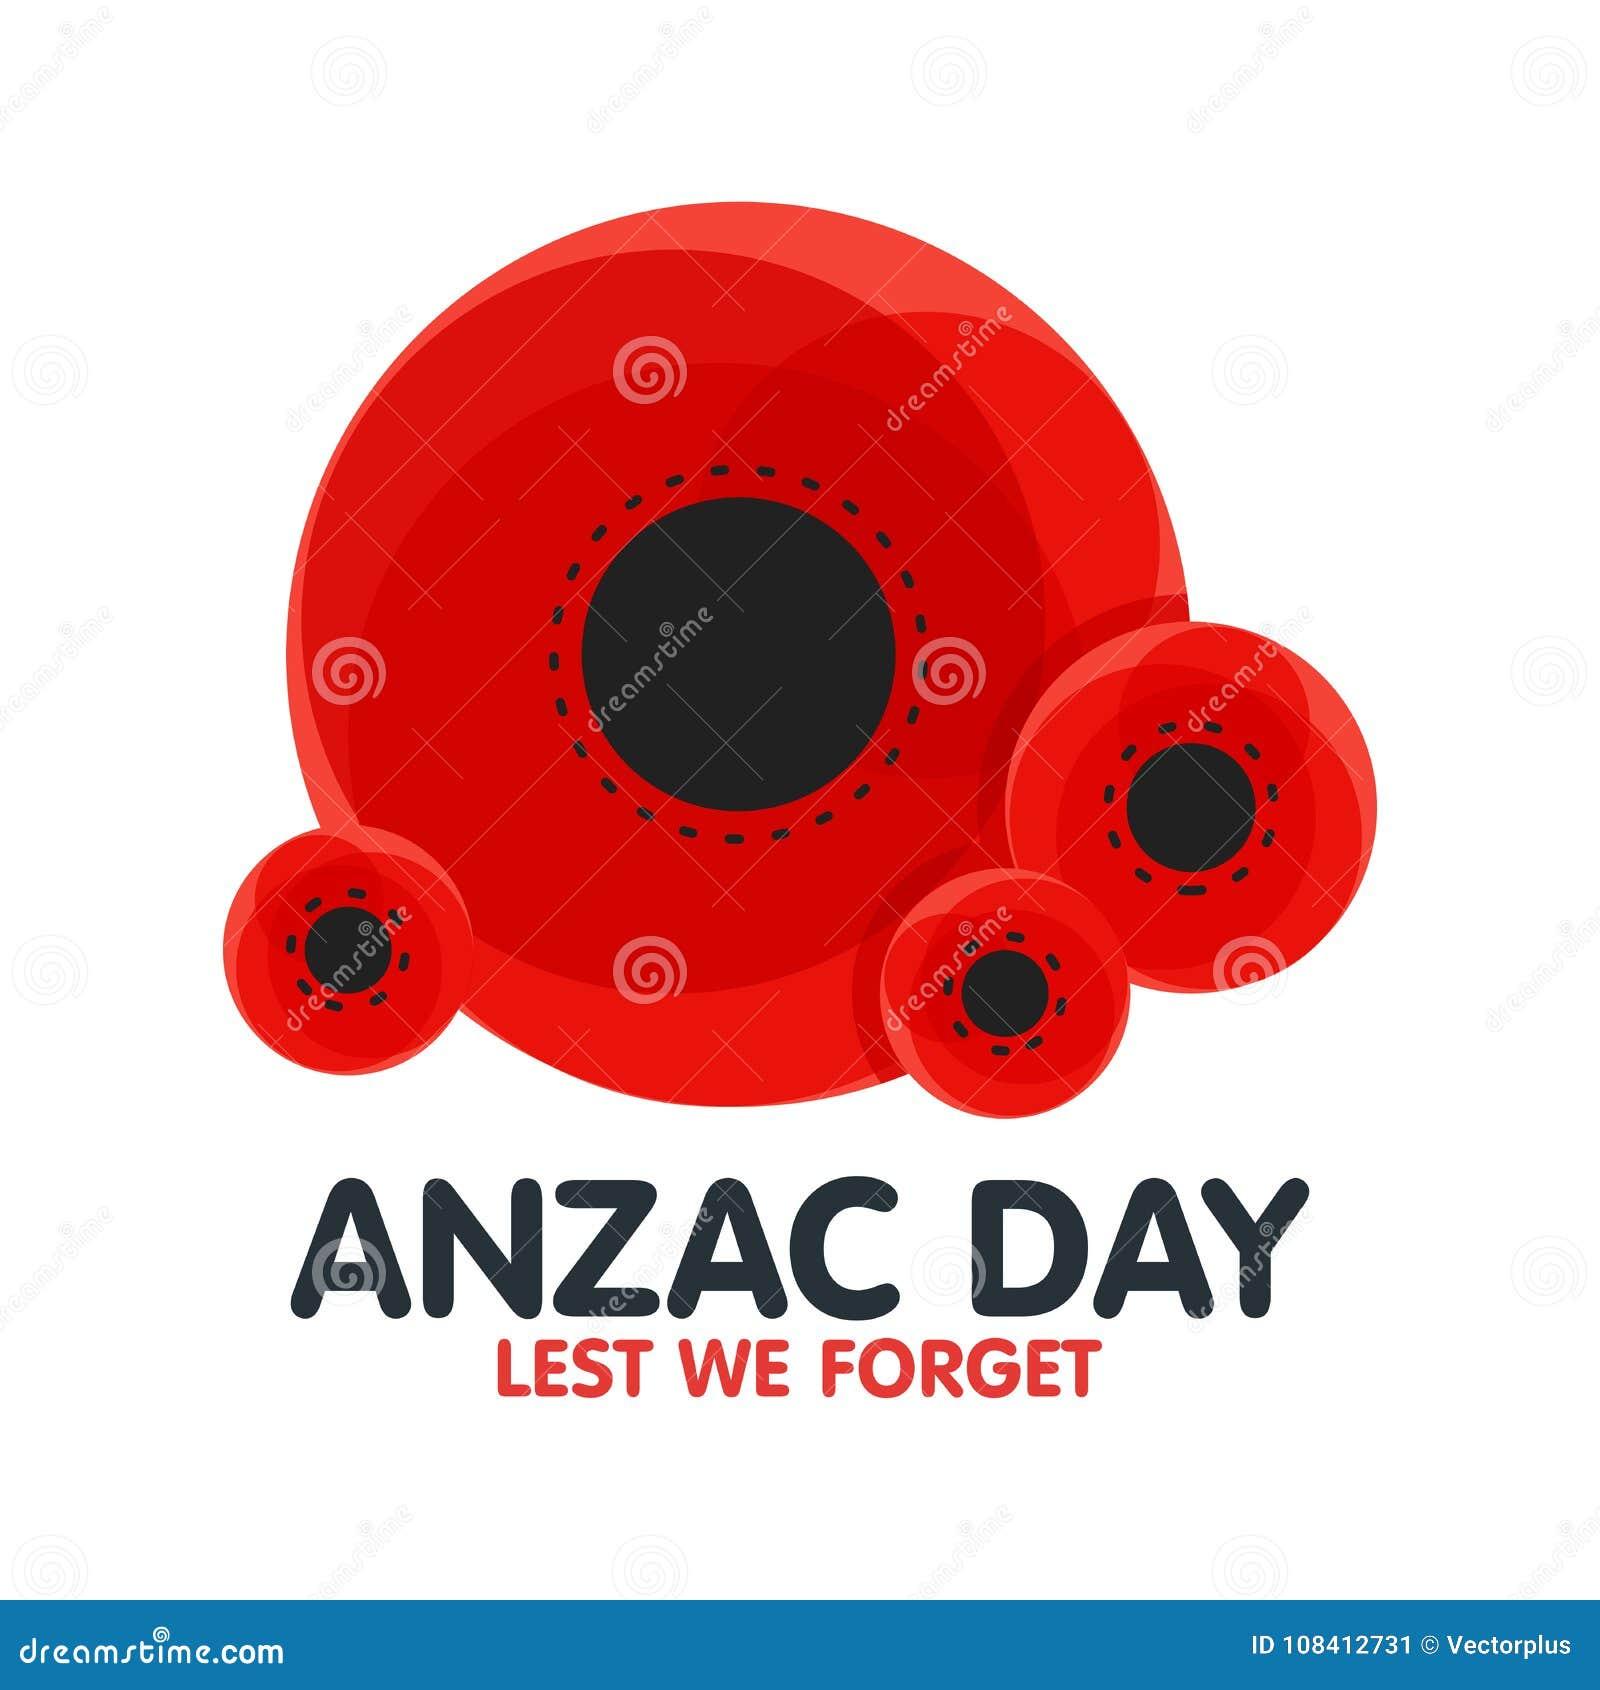 Bright poppy flower remembrance day symbol anzac day in australia download bright poppy flower remembrance day symbol anzac day in australia lest we forget mightylinksfo